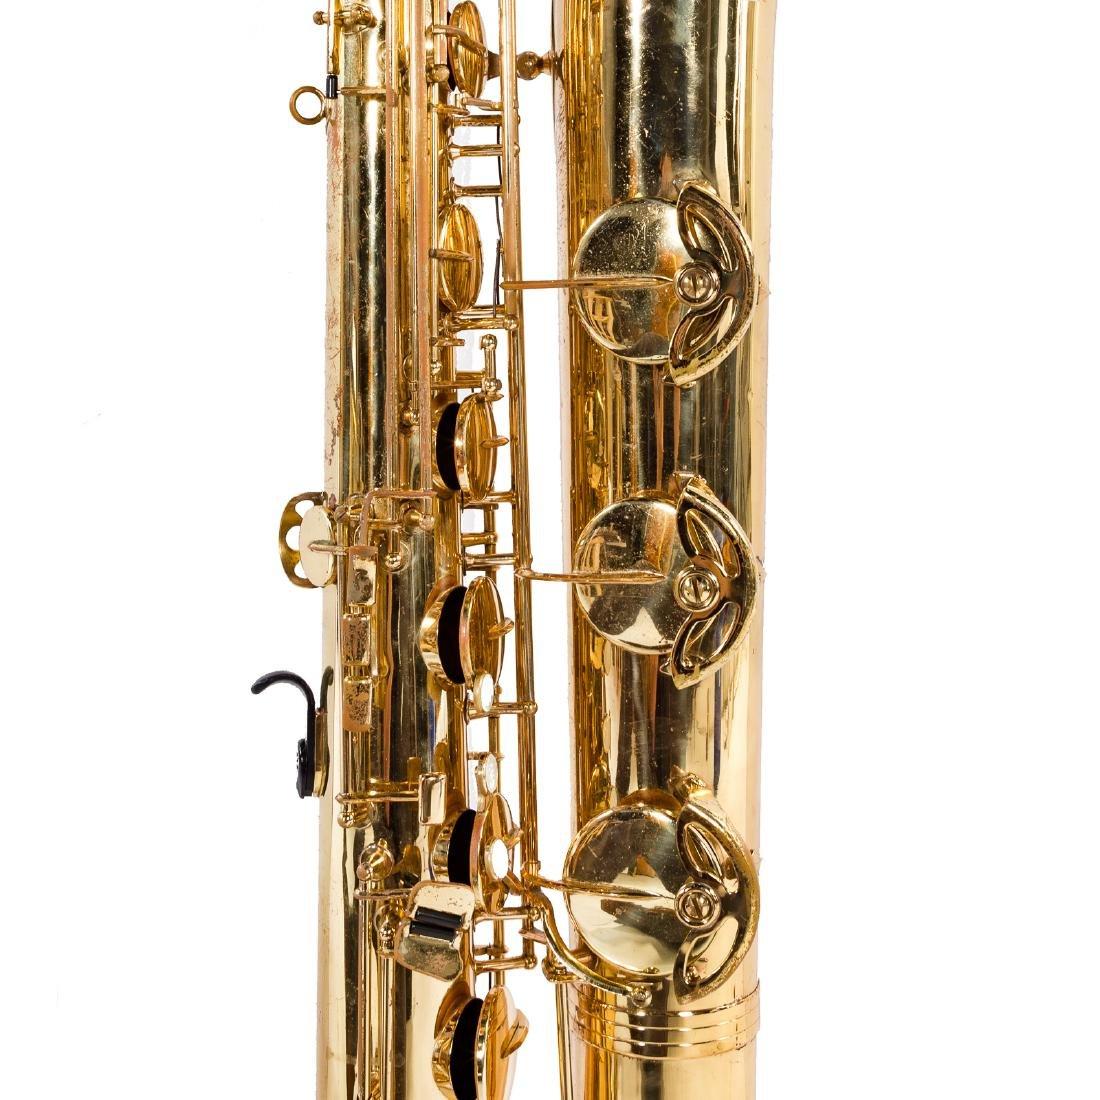 K.H.S. Jupiter alto saxophone - 6